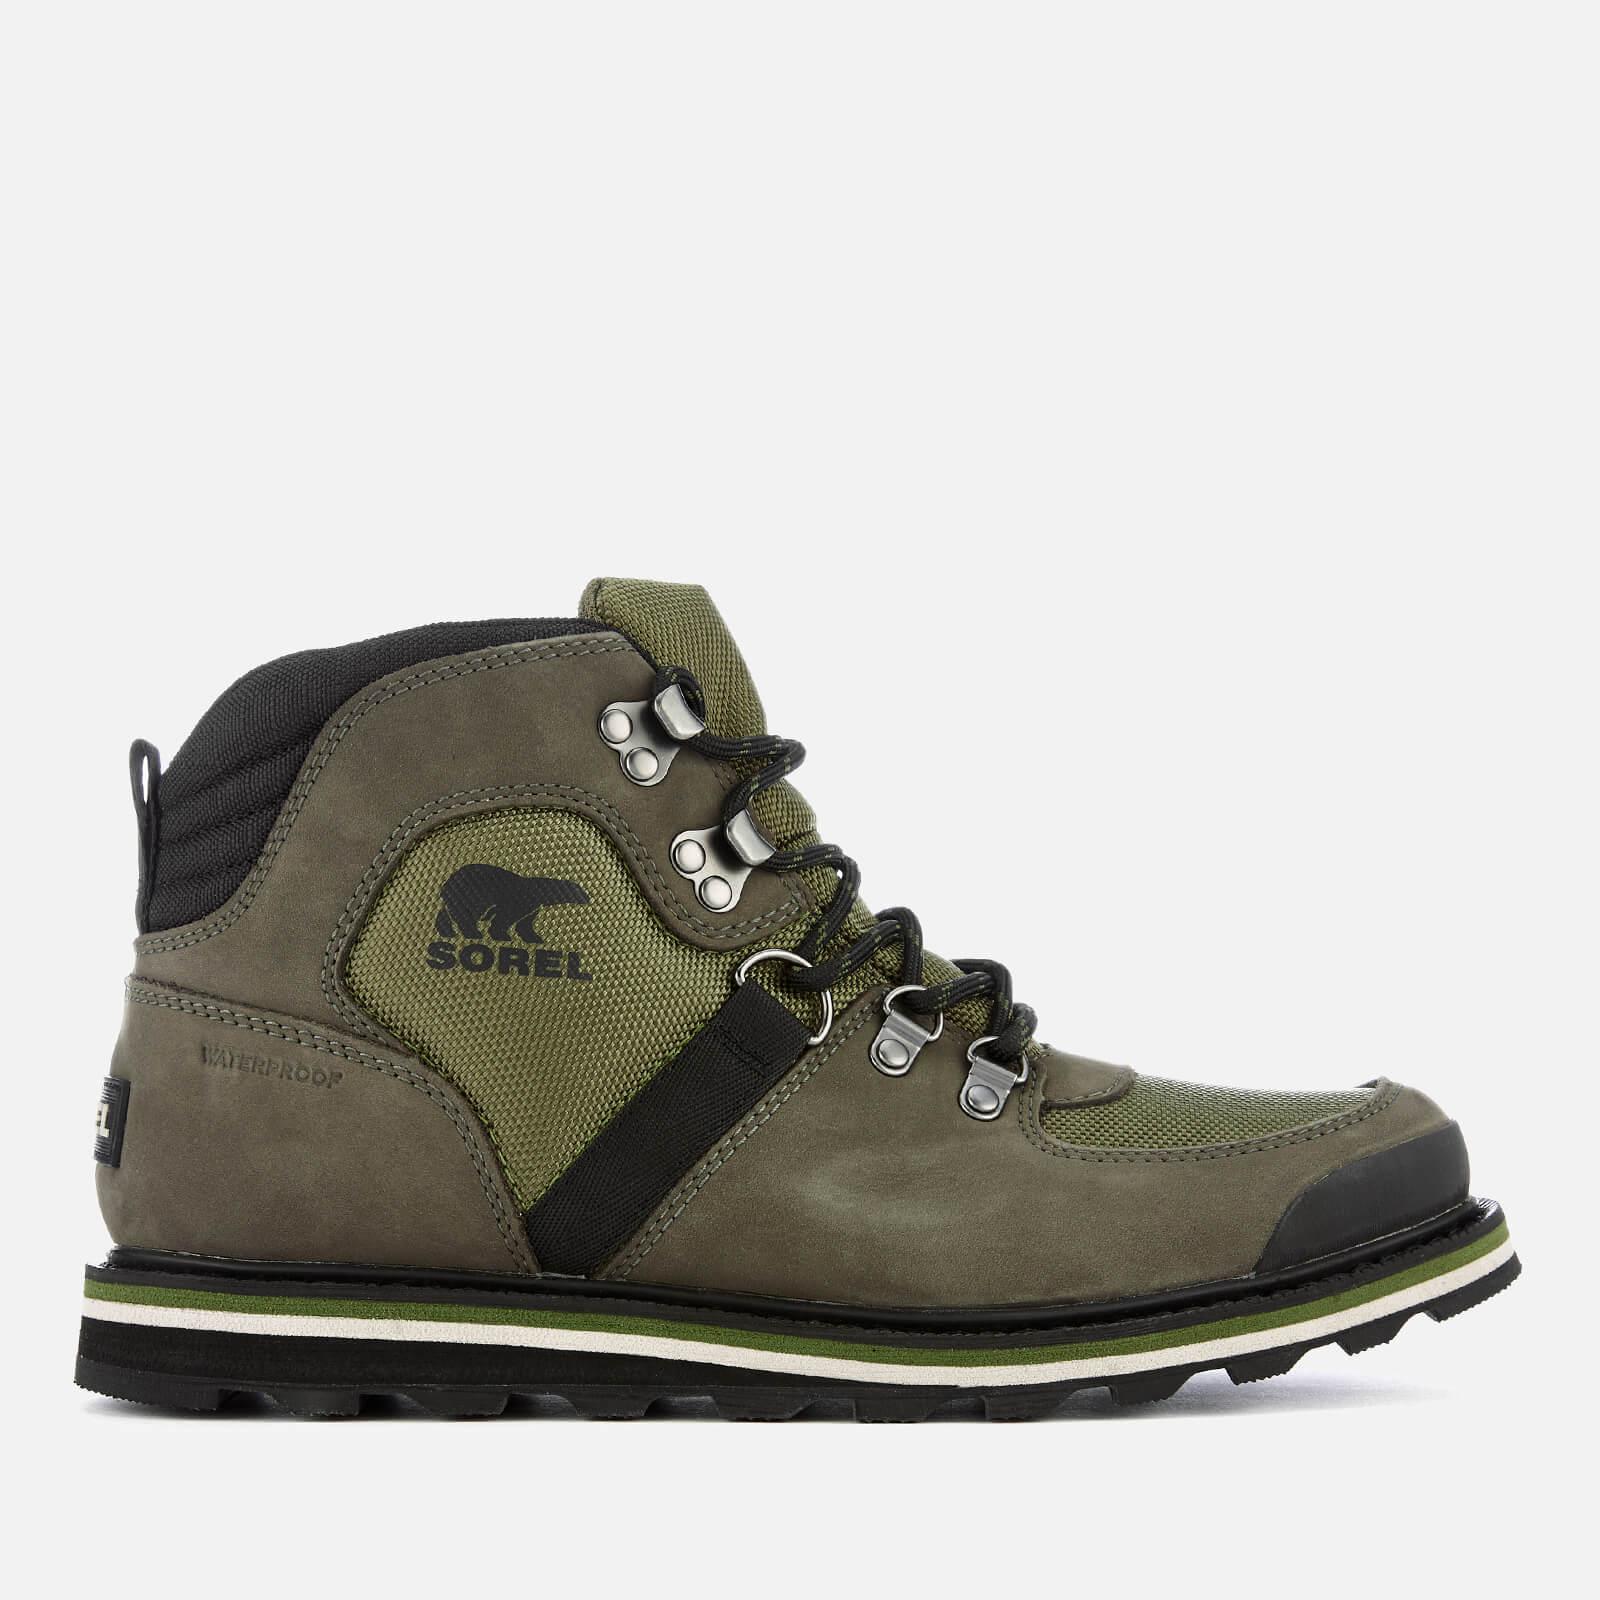 Sorel Men's Madson Sport Hiker Style Boots - Hiker Green - UK 11